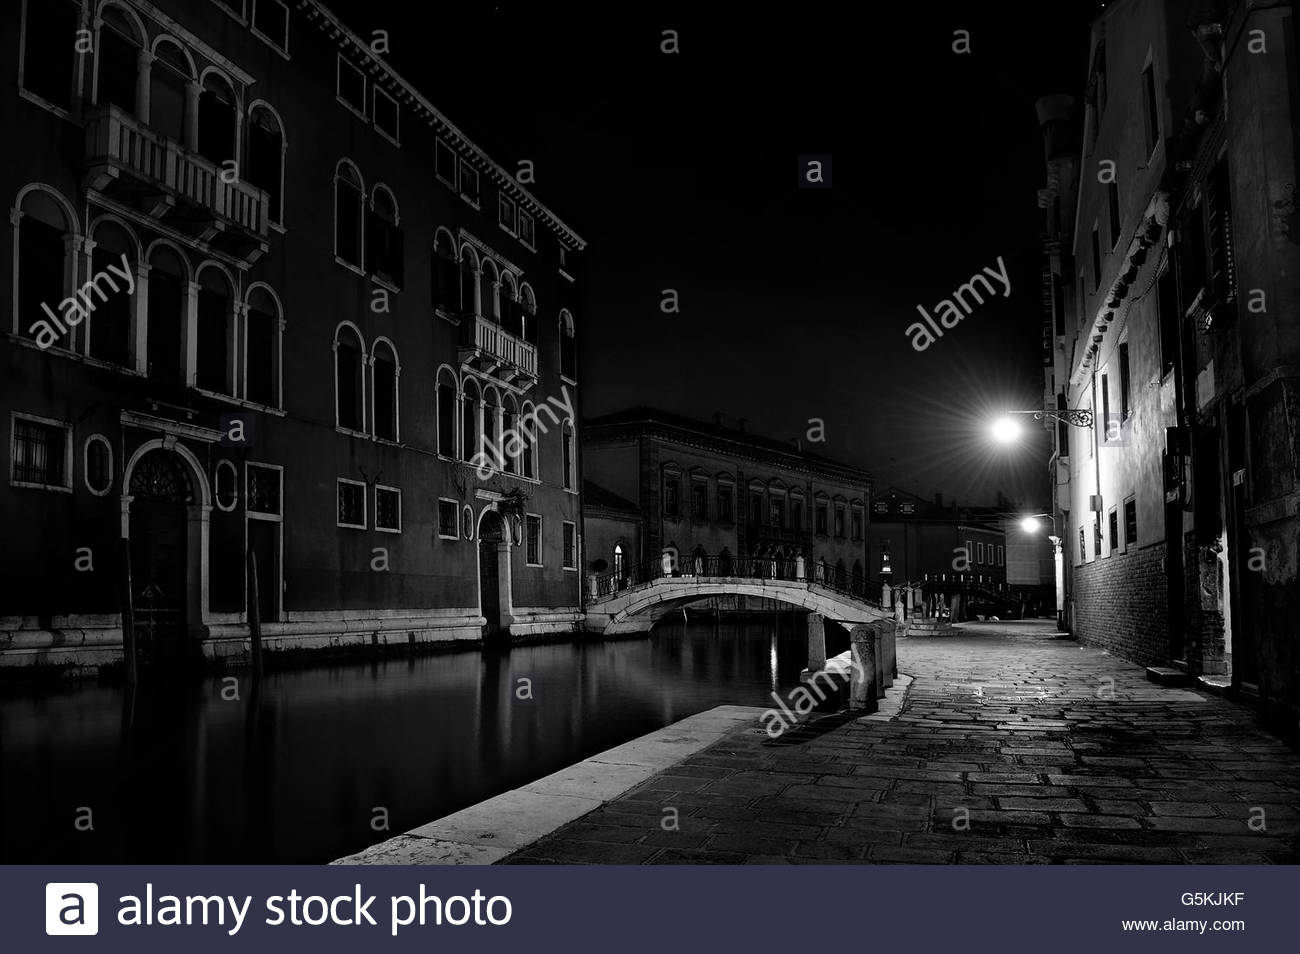 Night scene of a Venetian canal - Stock Image